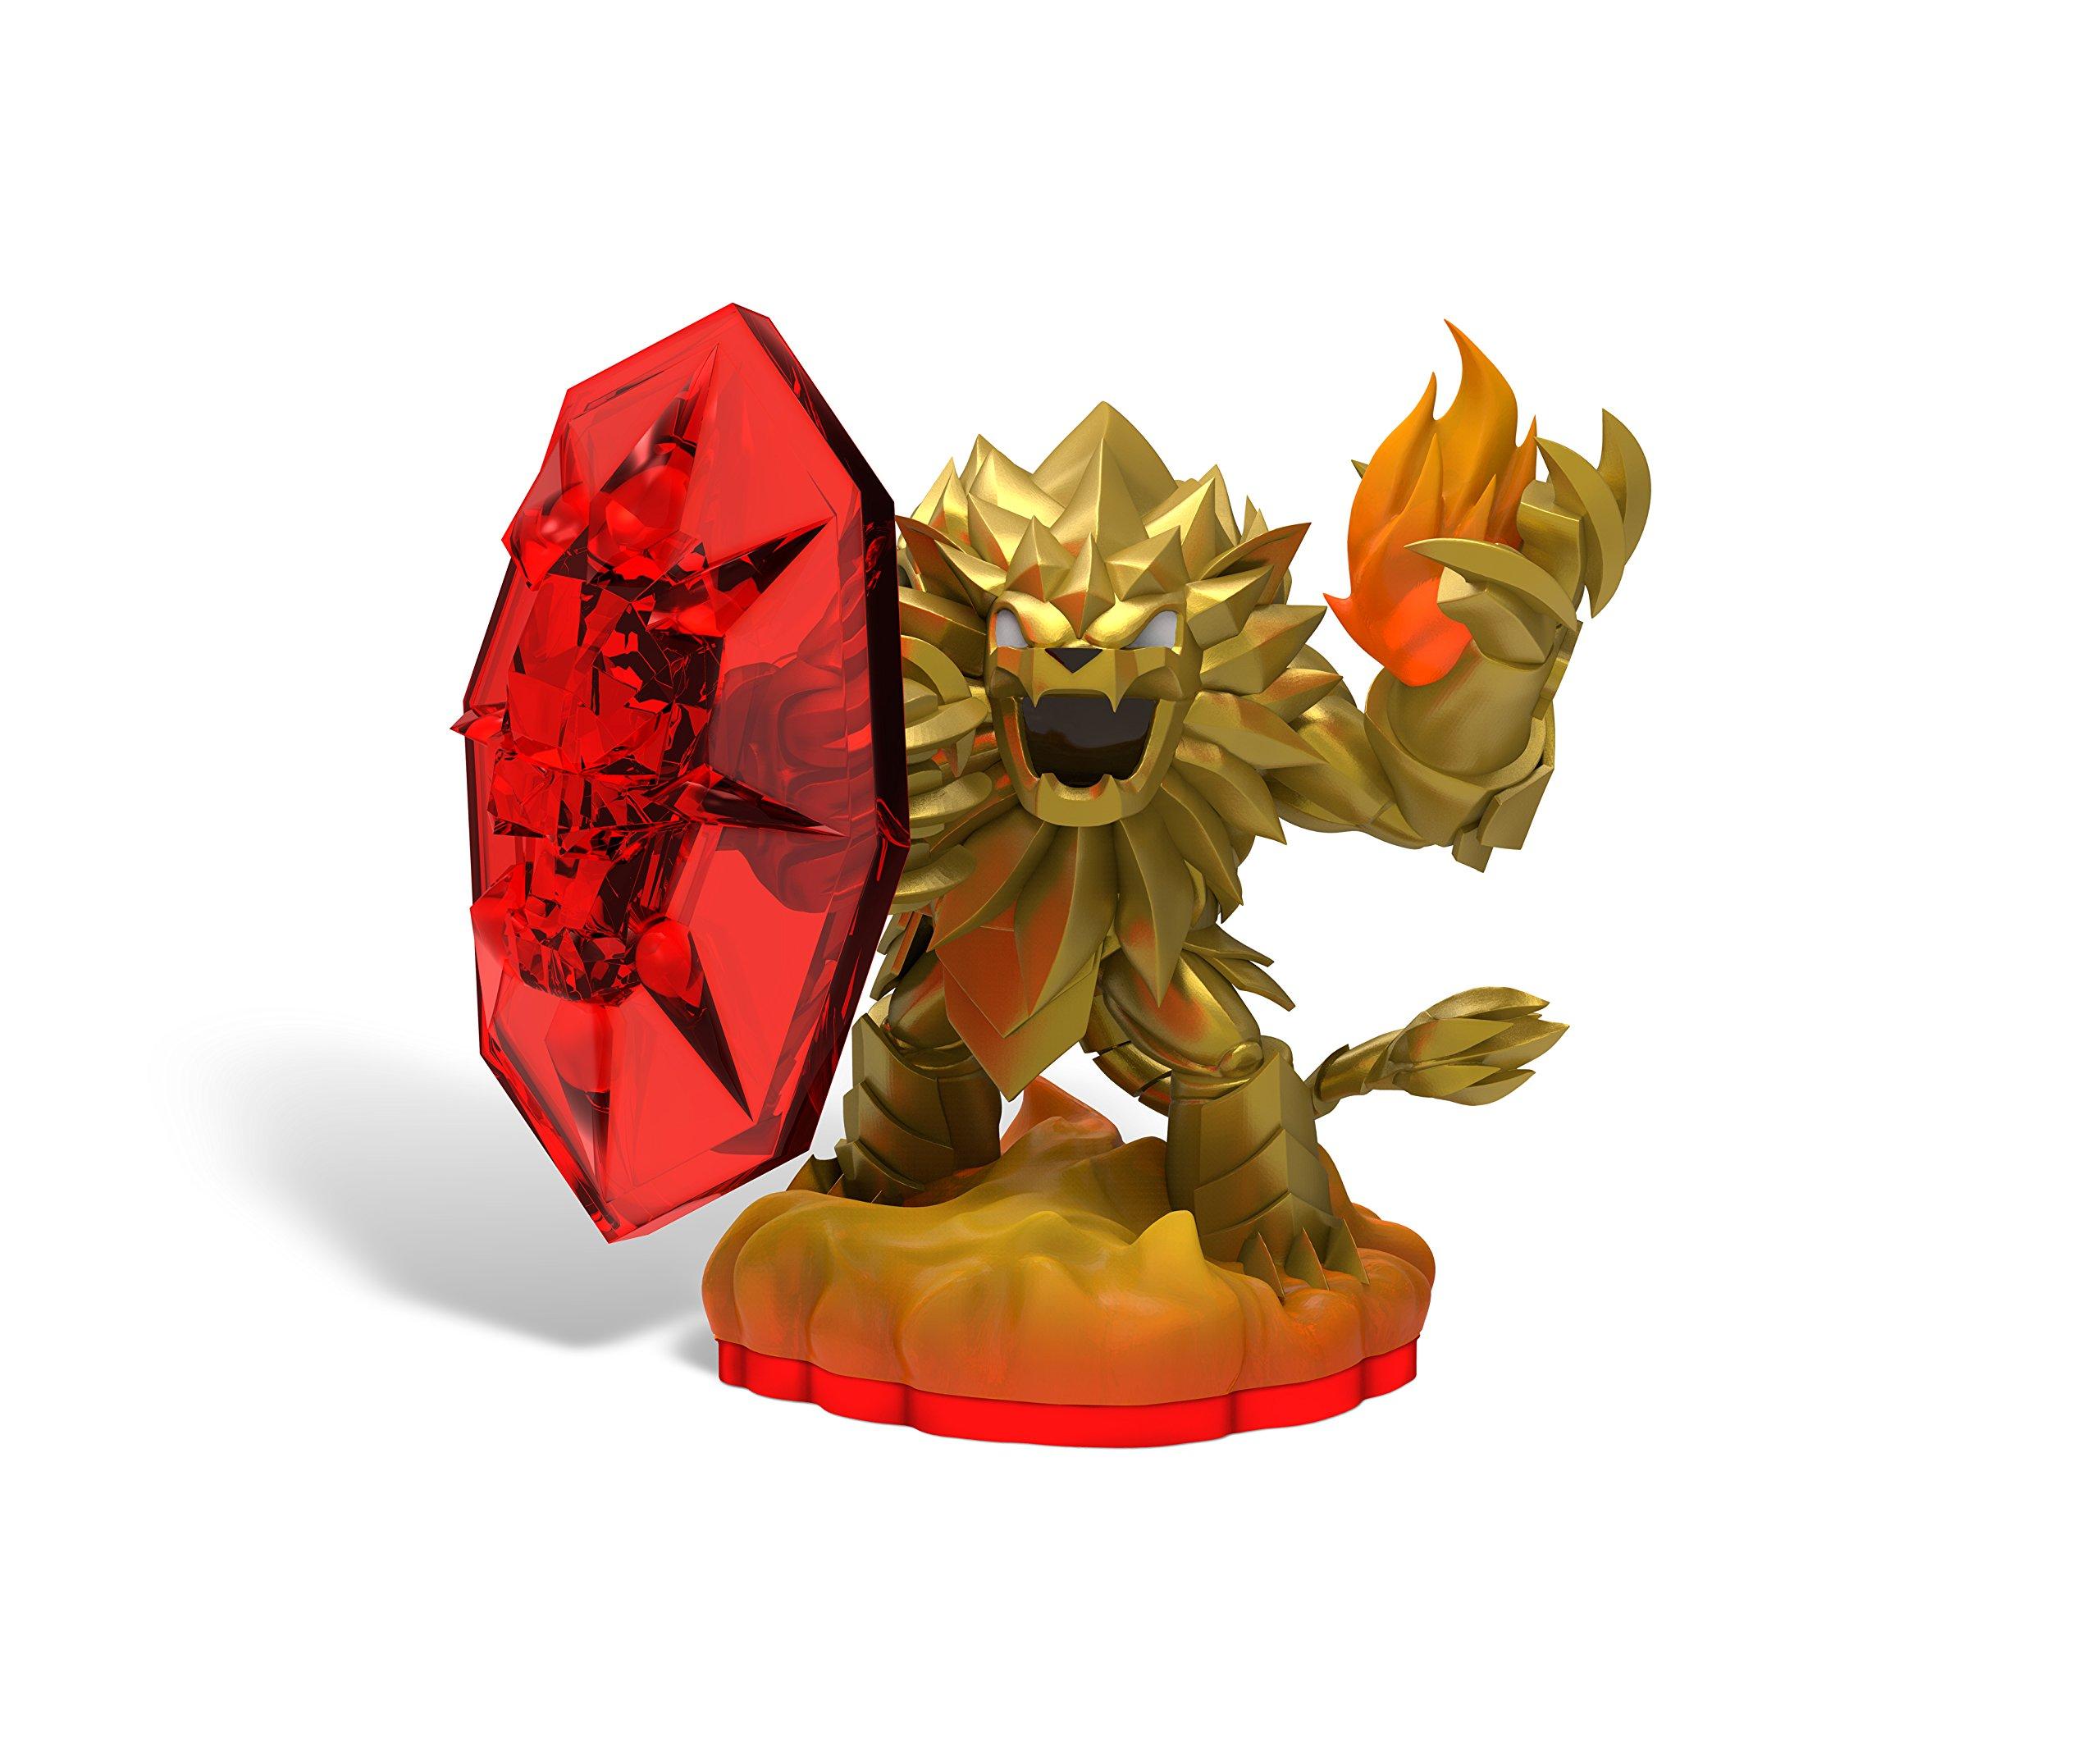 Amazon.com: Skylanders SWAP Force Single Character Pack